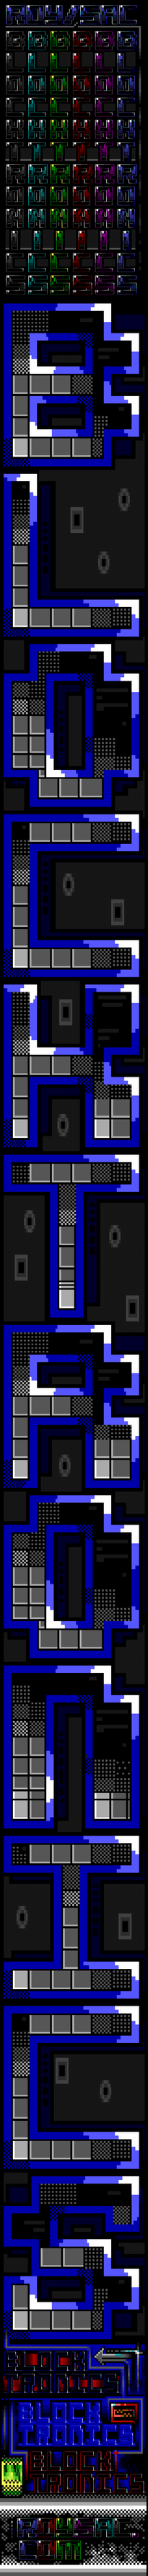 Blocktronics 5 by roy-sac